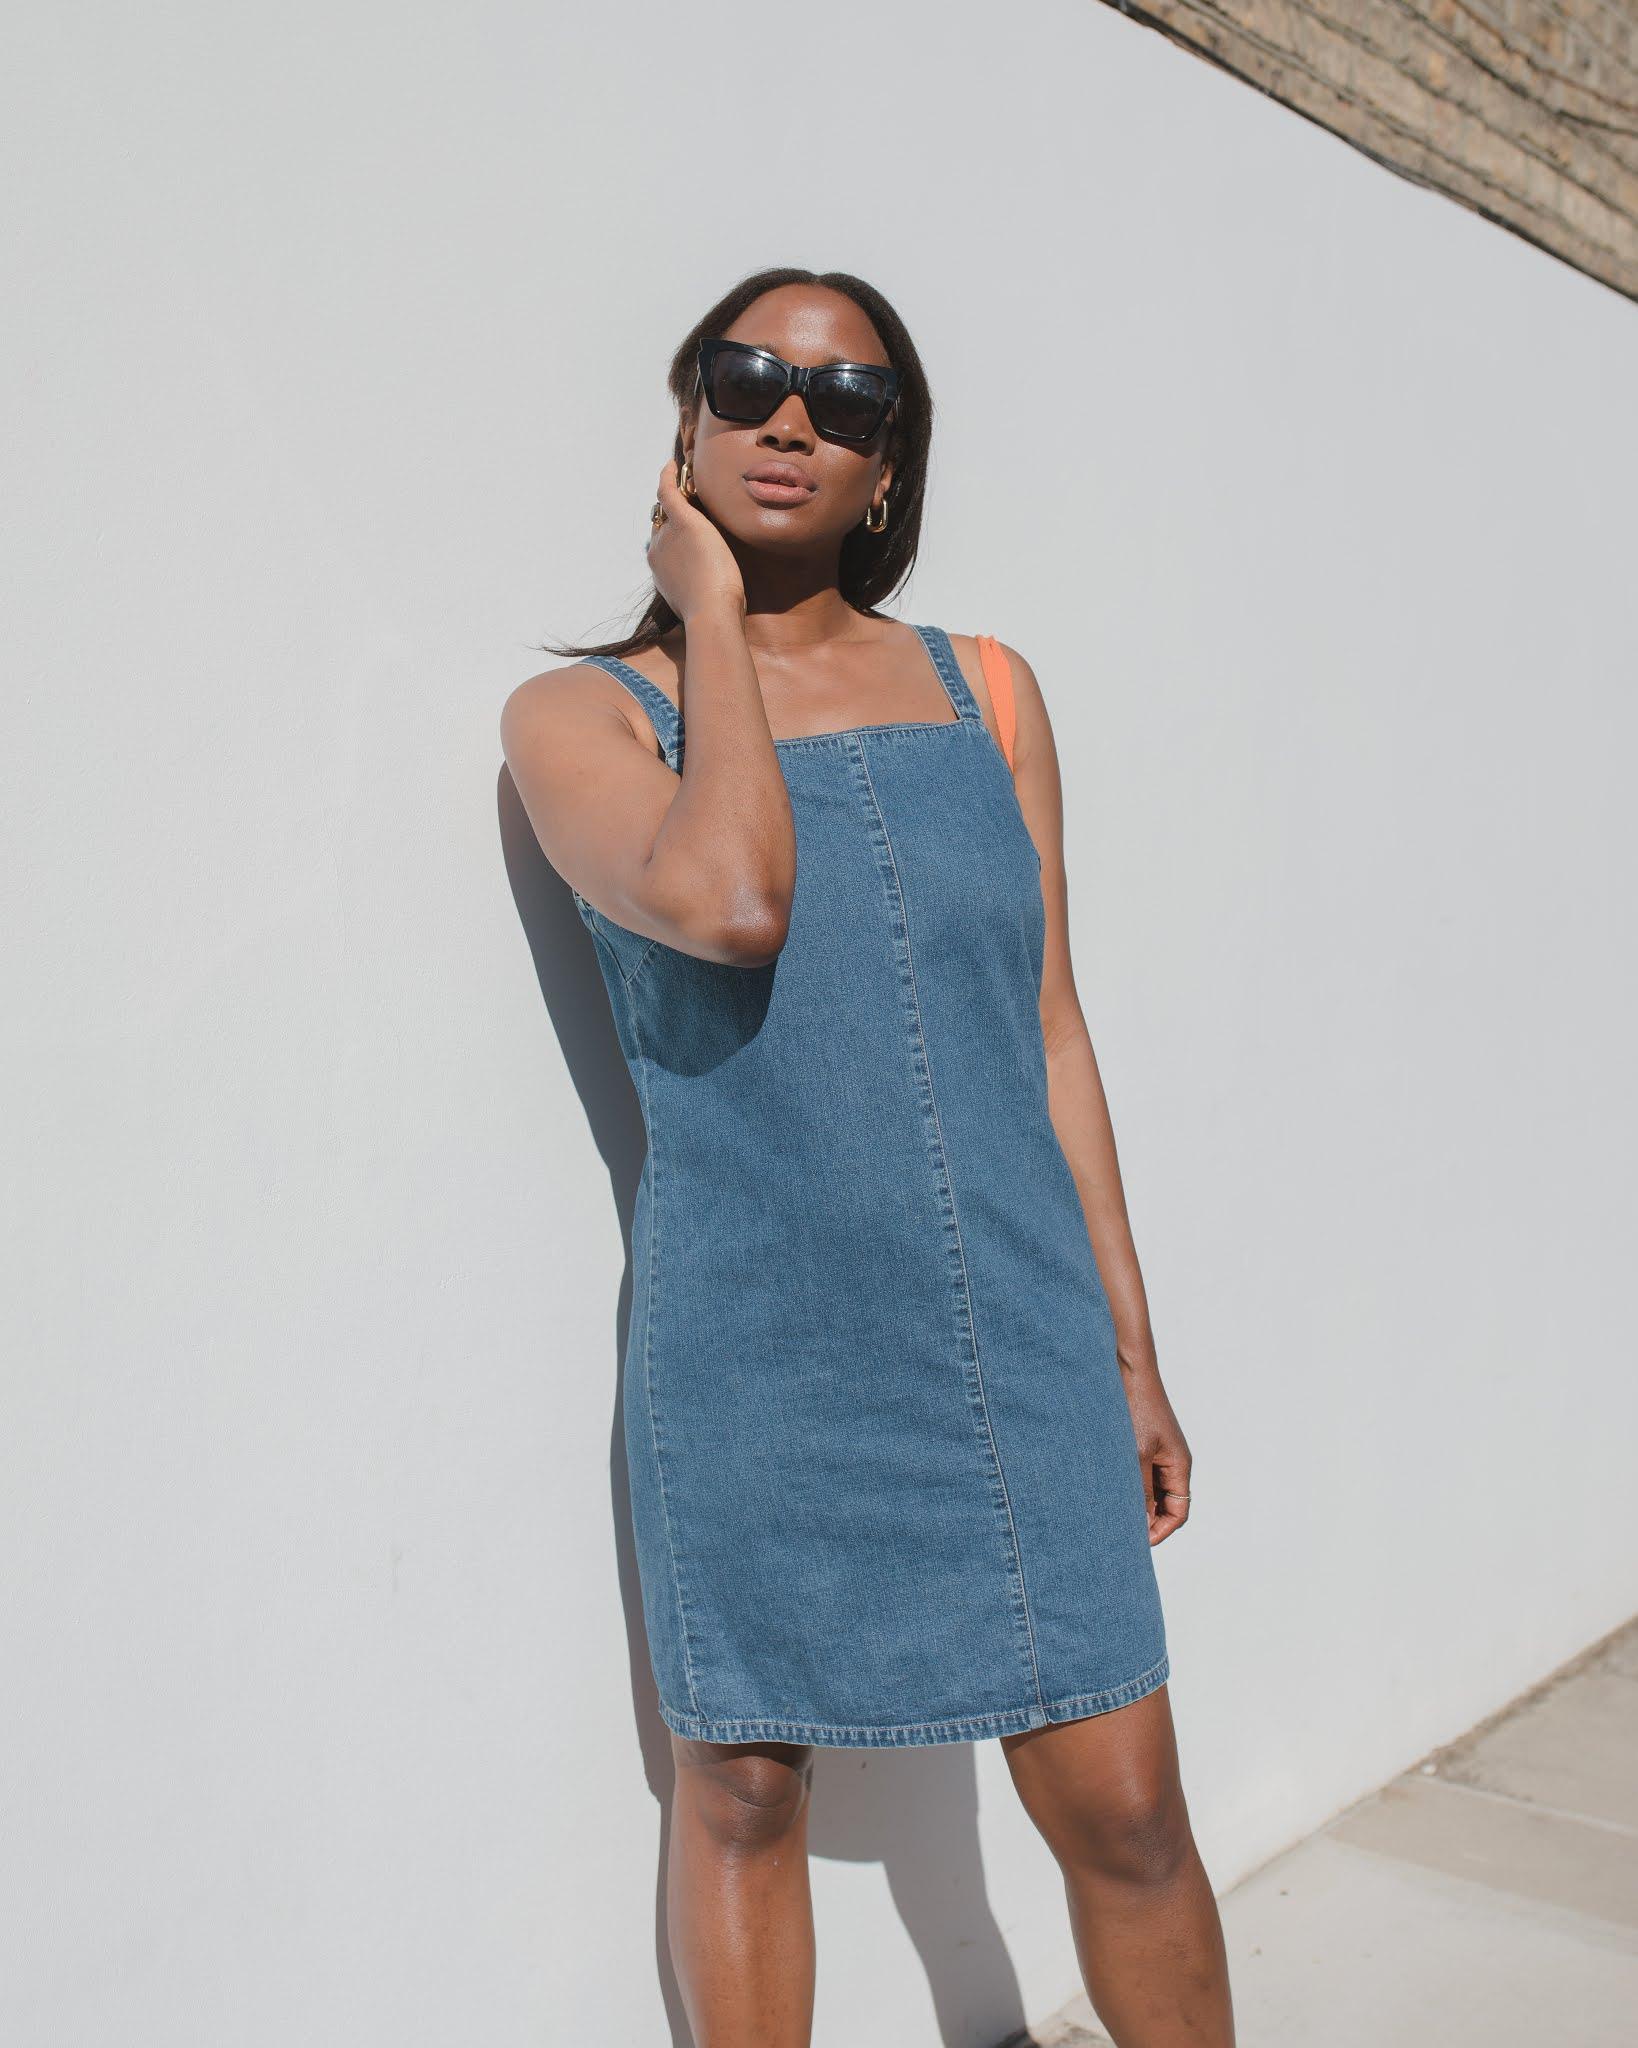 THE DENIM 70'S DRESS | SUMMER LOOK